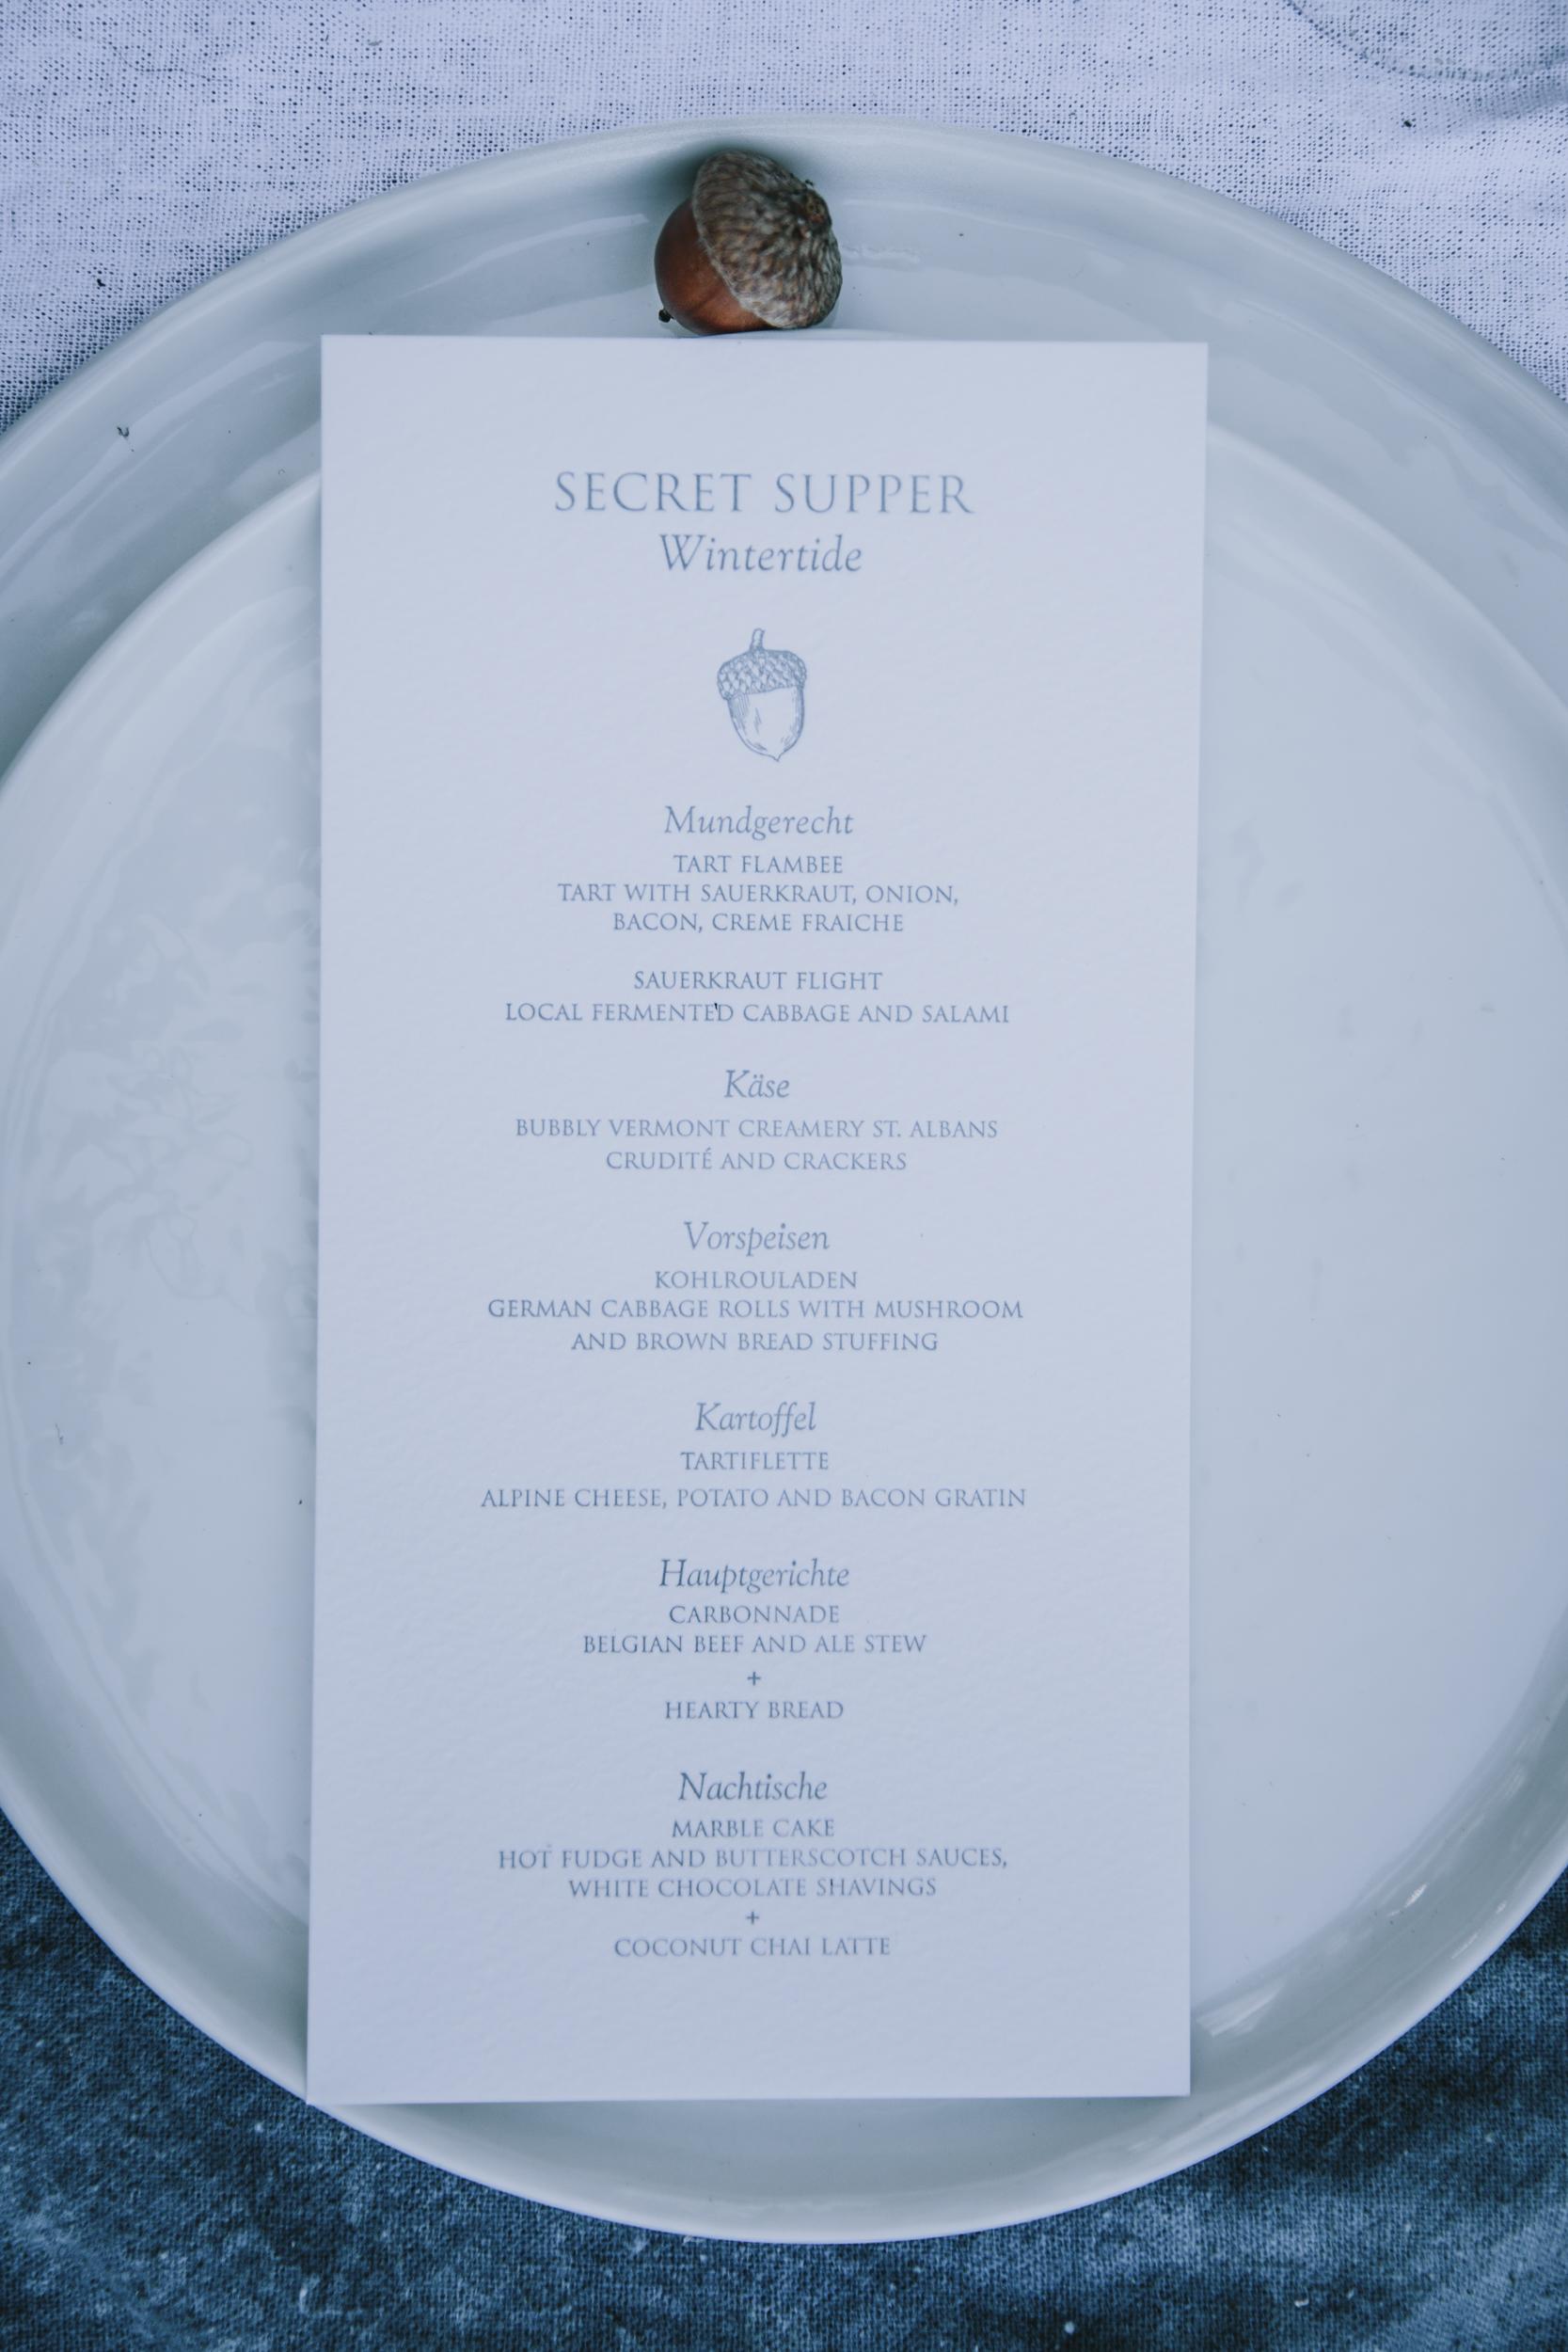 wintertide secret supper by eva kosmas flores | adventures in cooking-22.jpeg